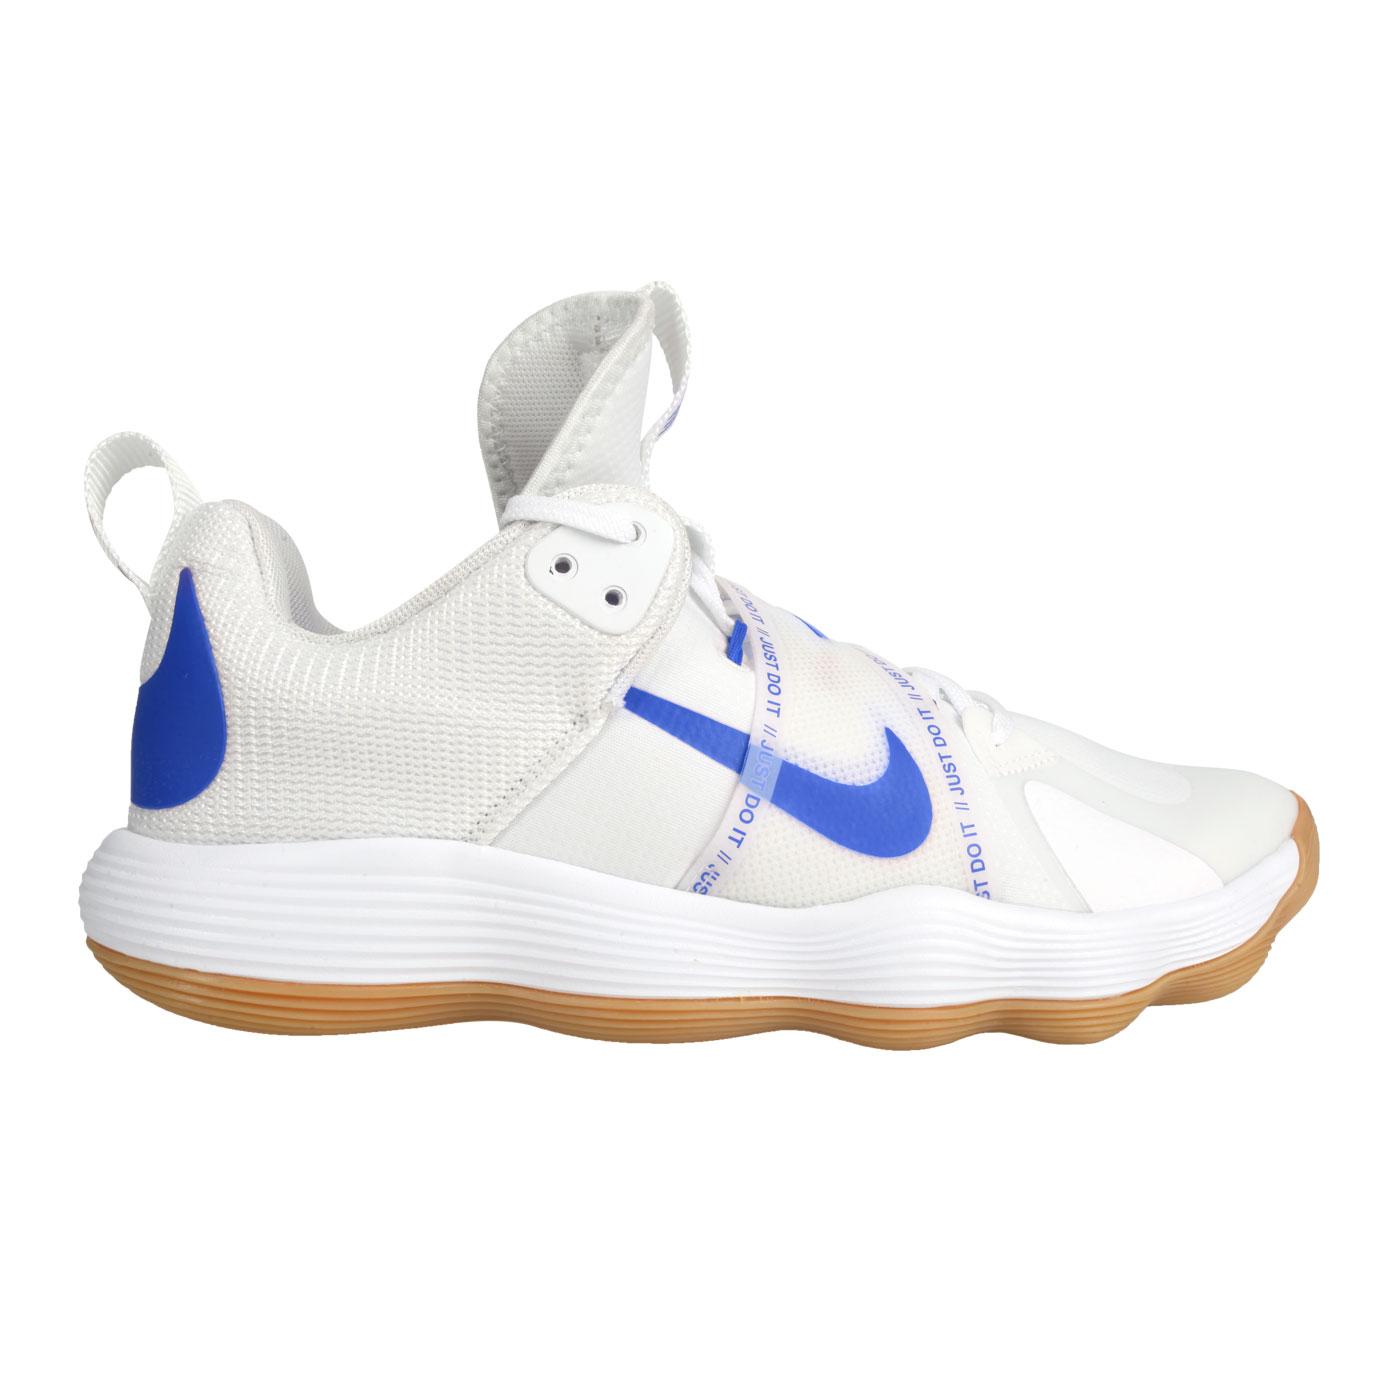 NIKE 男款排球室內運動鞋  @REACT HYPERSET@CI2955140 - 白藍